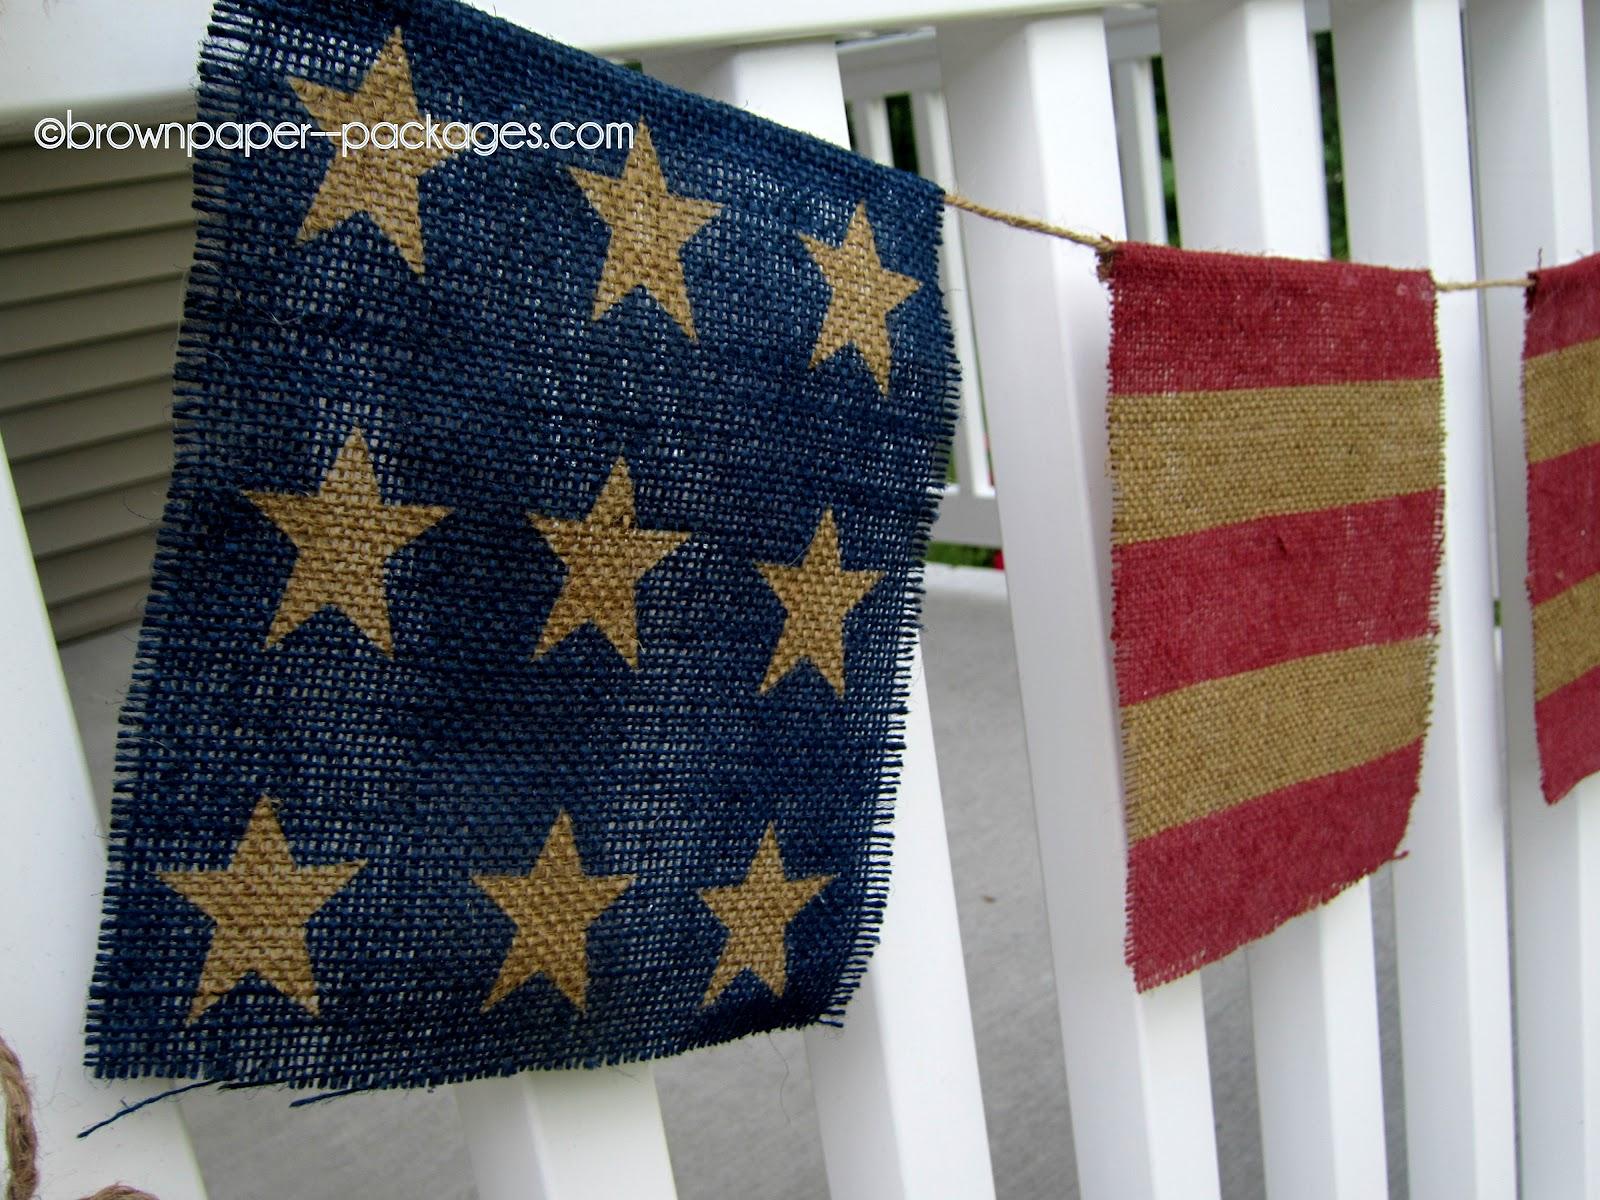 Home Made Modern: Craft of the Week: Burlap Patriotic Bunting